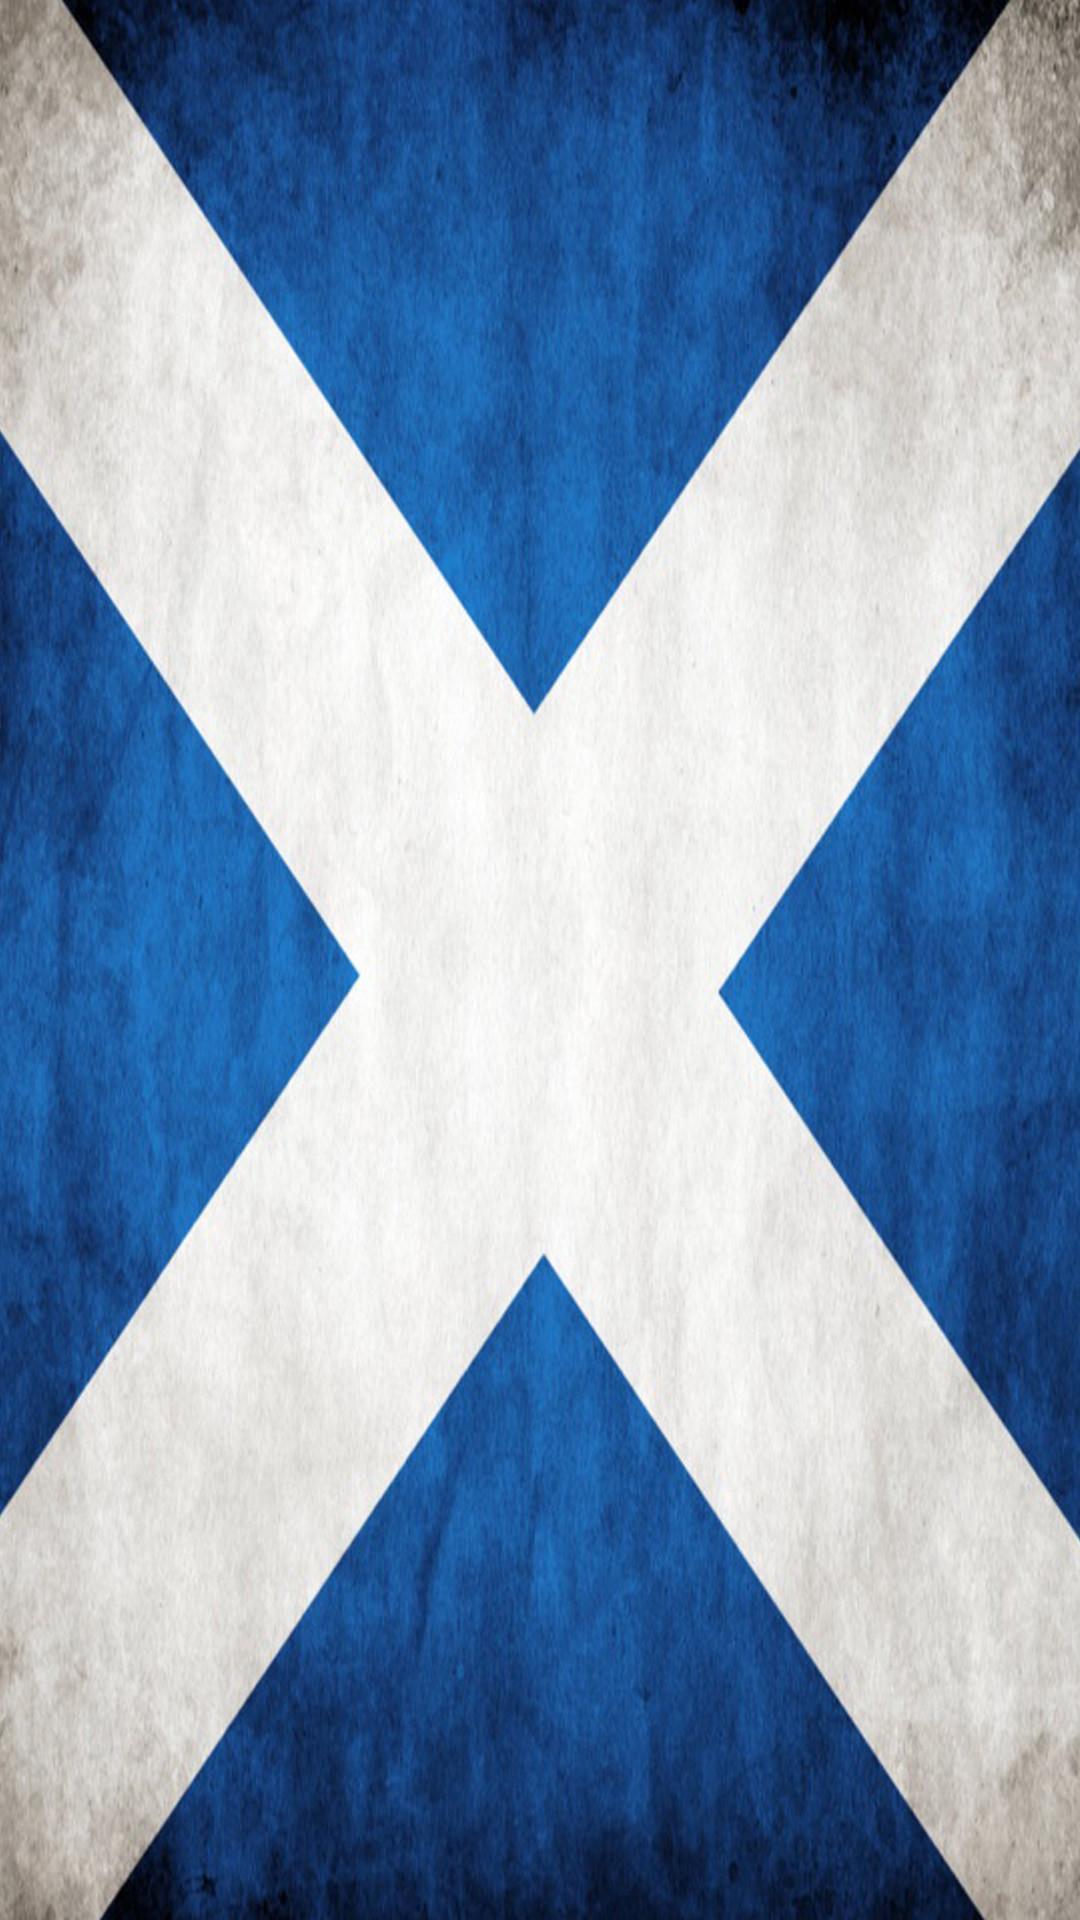 Flag Scotland Samsung Wallpapers, Samsung Galaxy S5 .